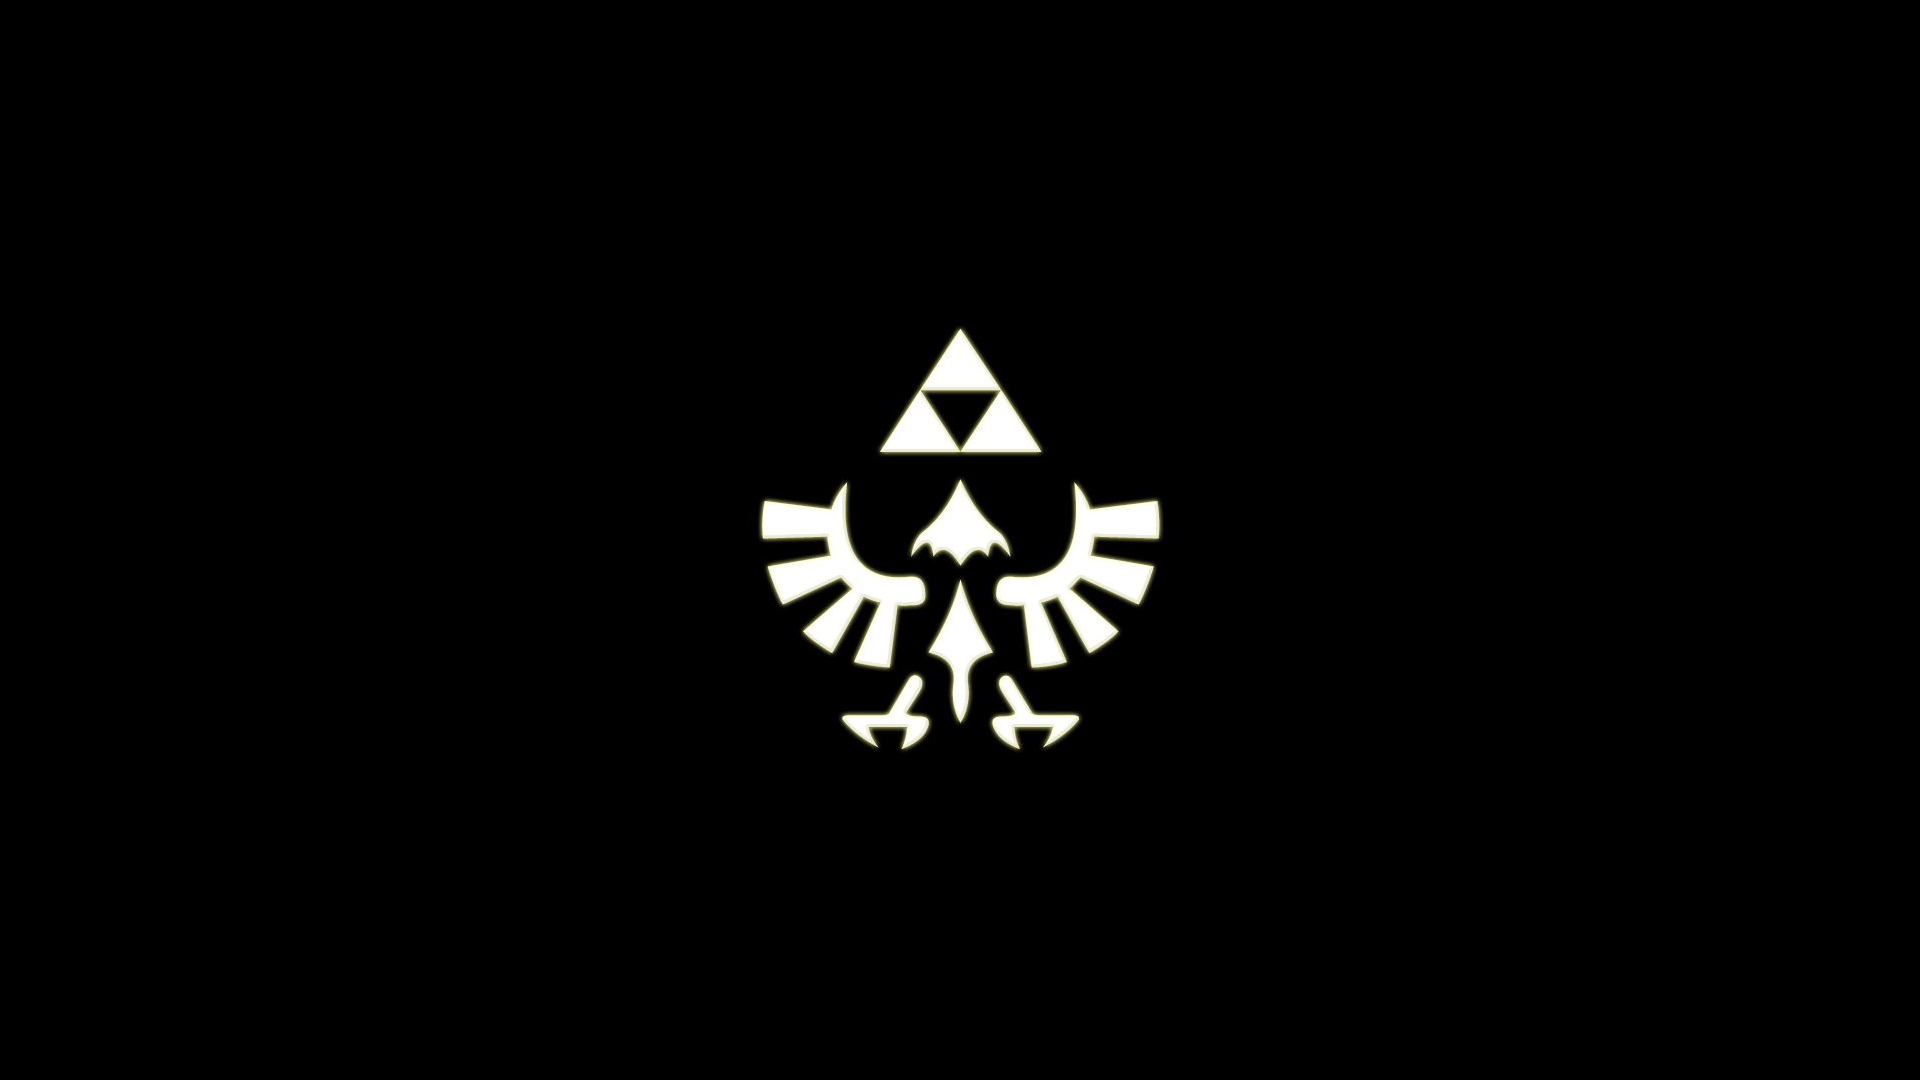 Legend Of Zelda Triforce Symbol Wallpaper Triforce the wallpaper 1920x1080